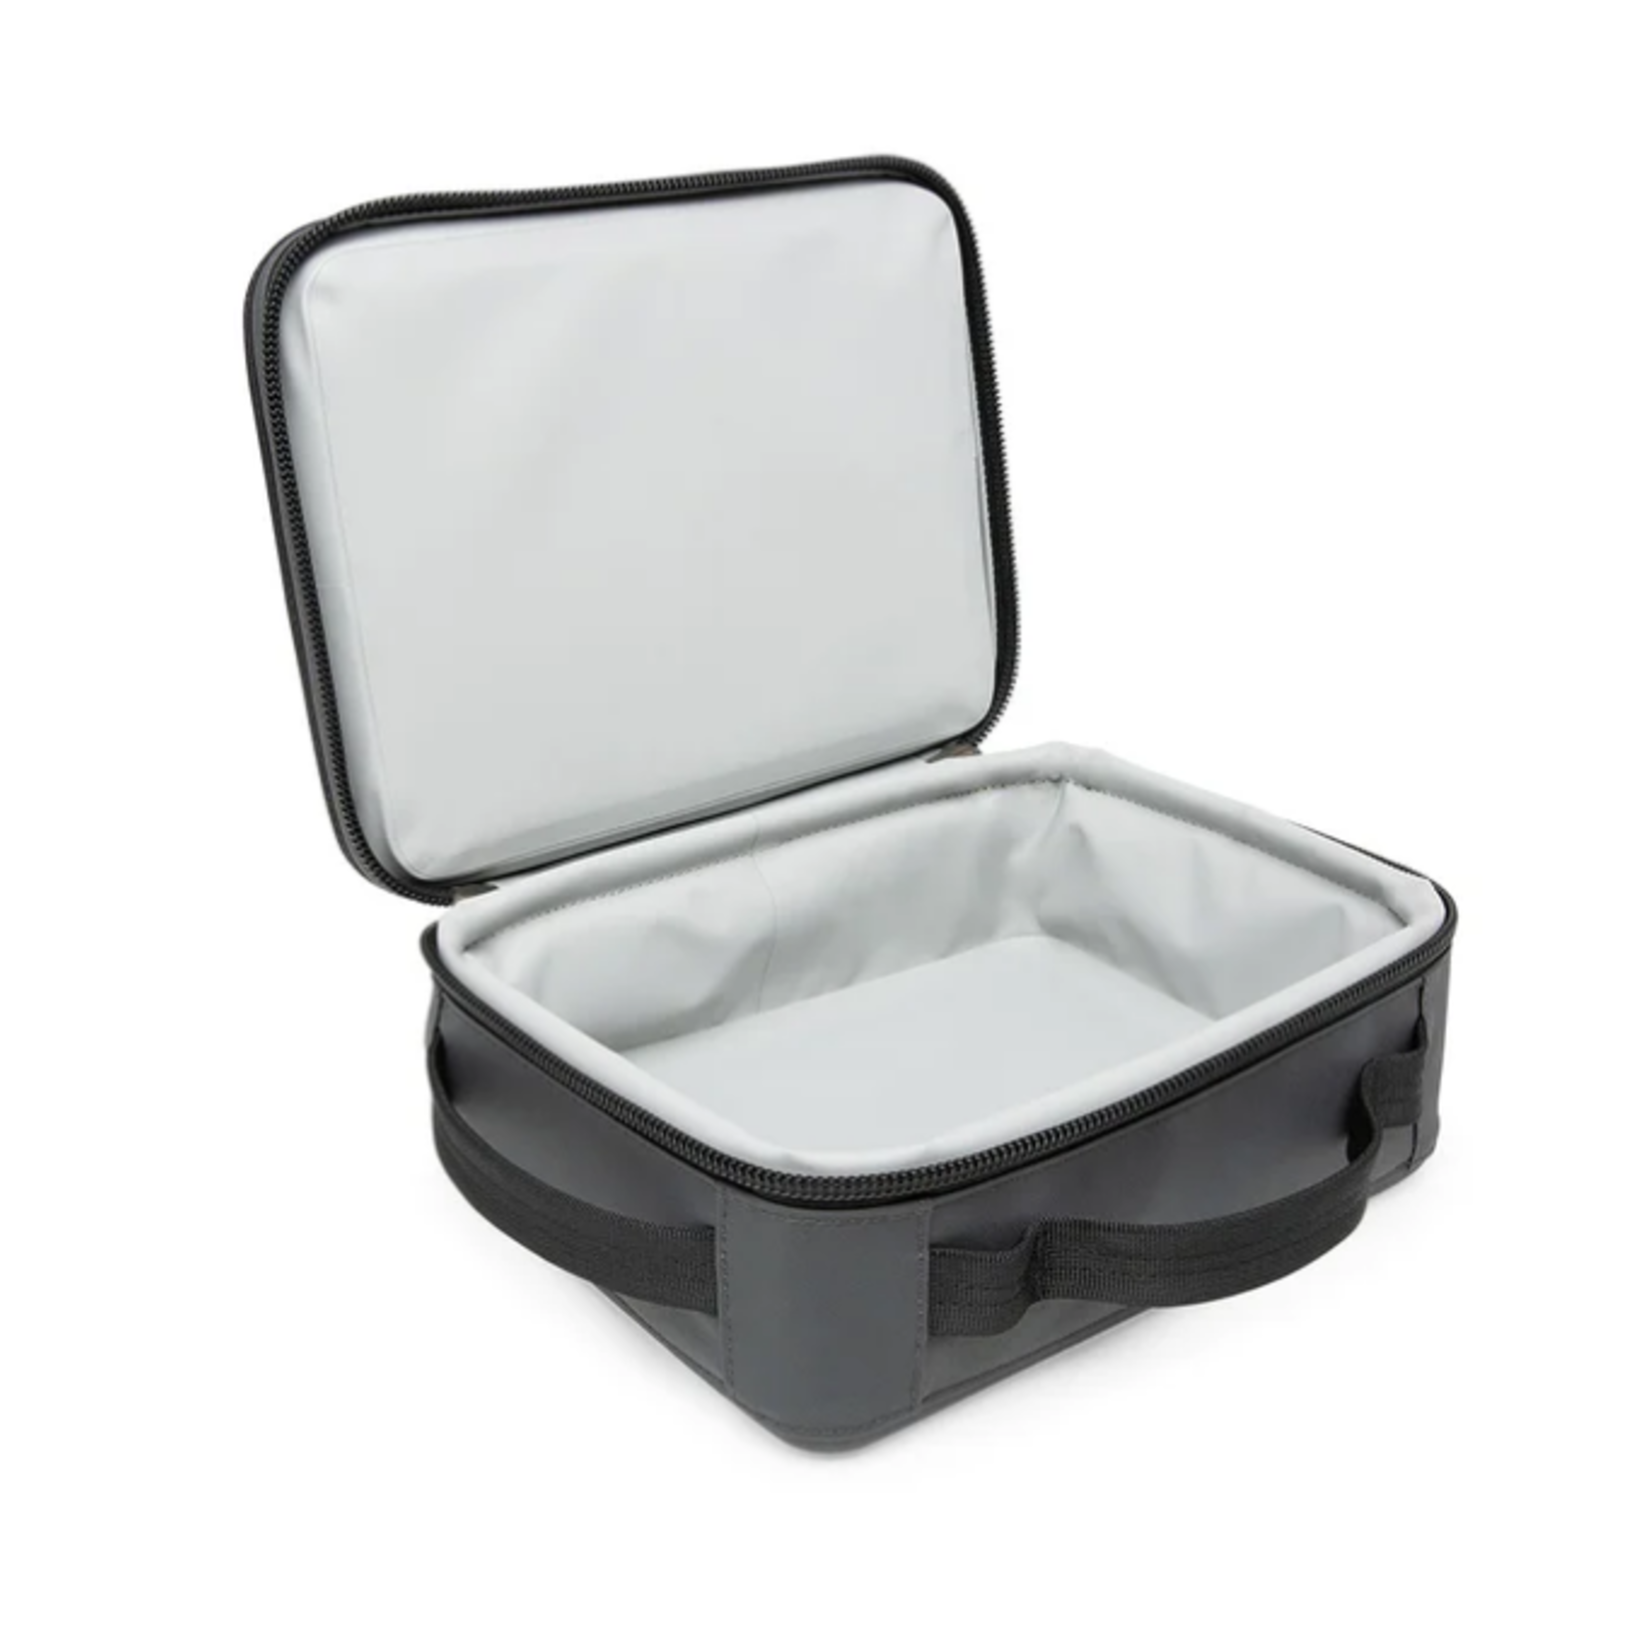 Yeti Yeti Daytrip Lunch Box